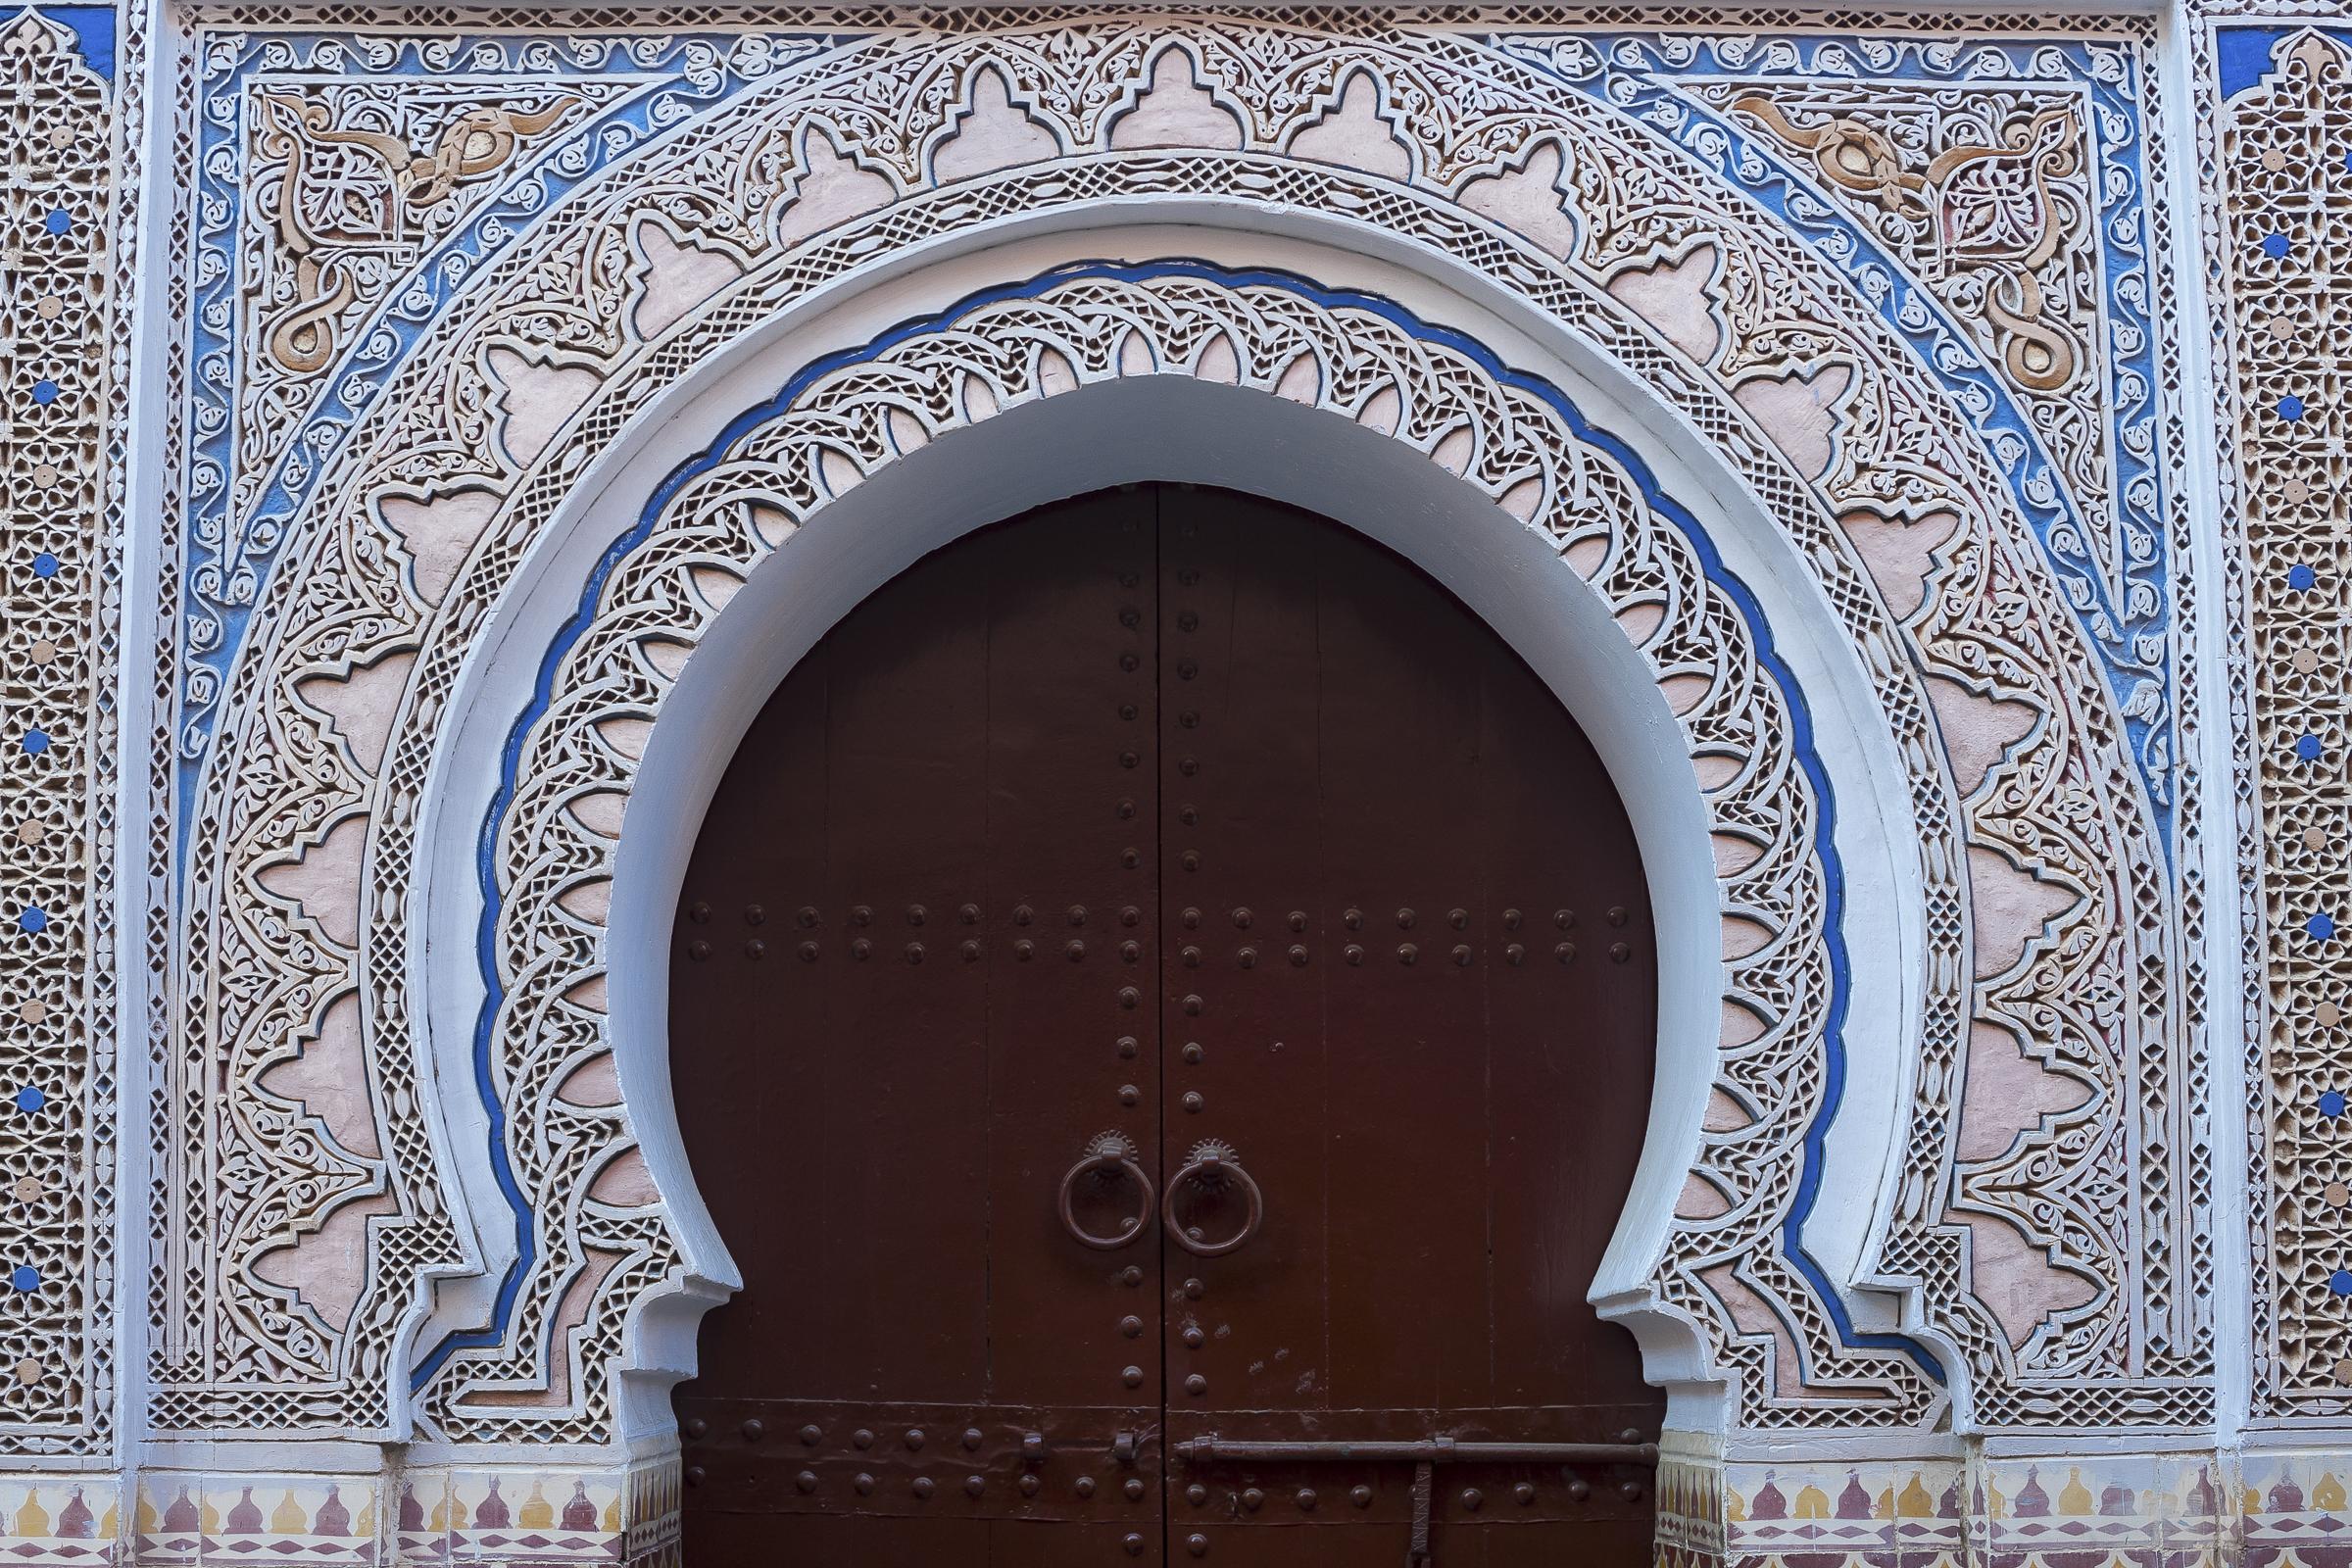 Architectural detail, Marrakech